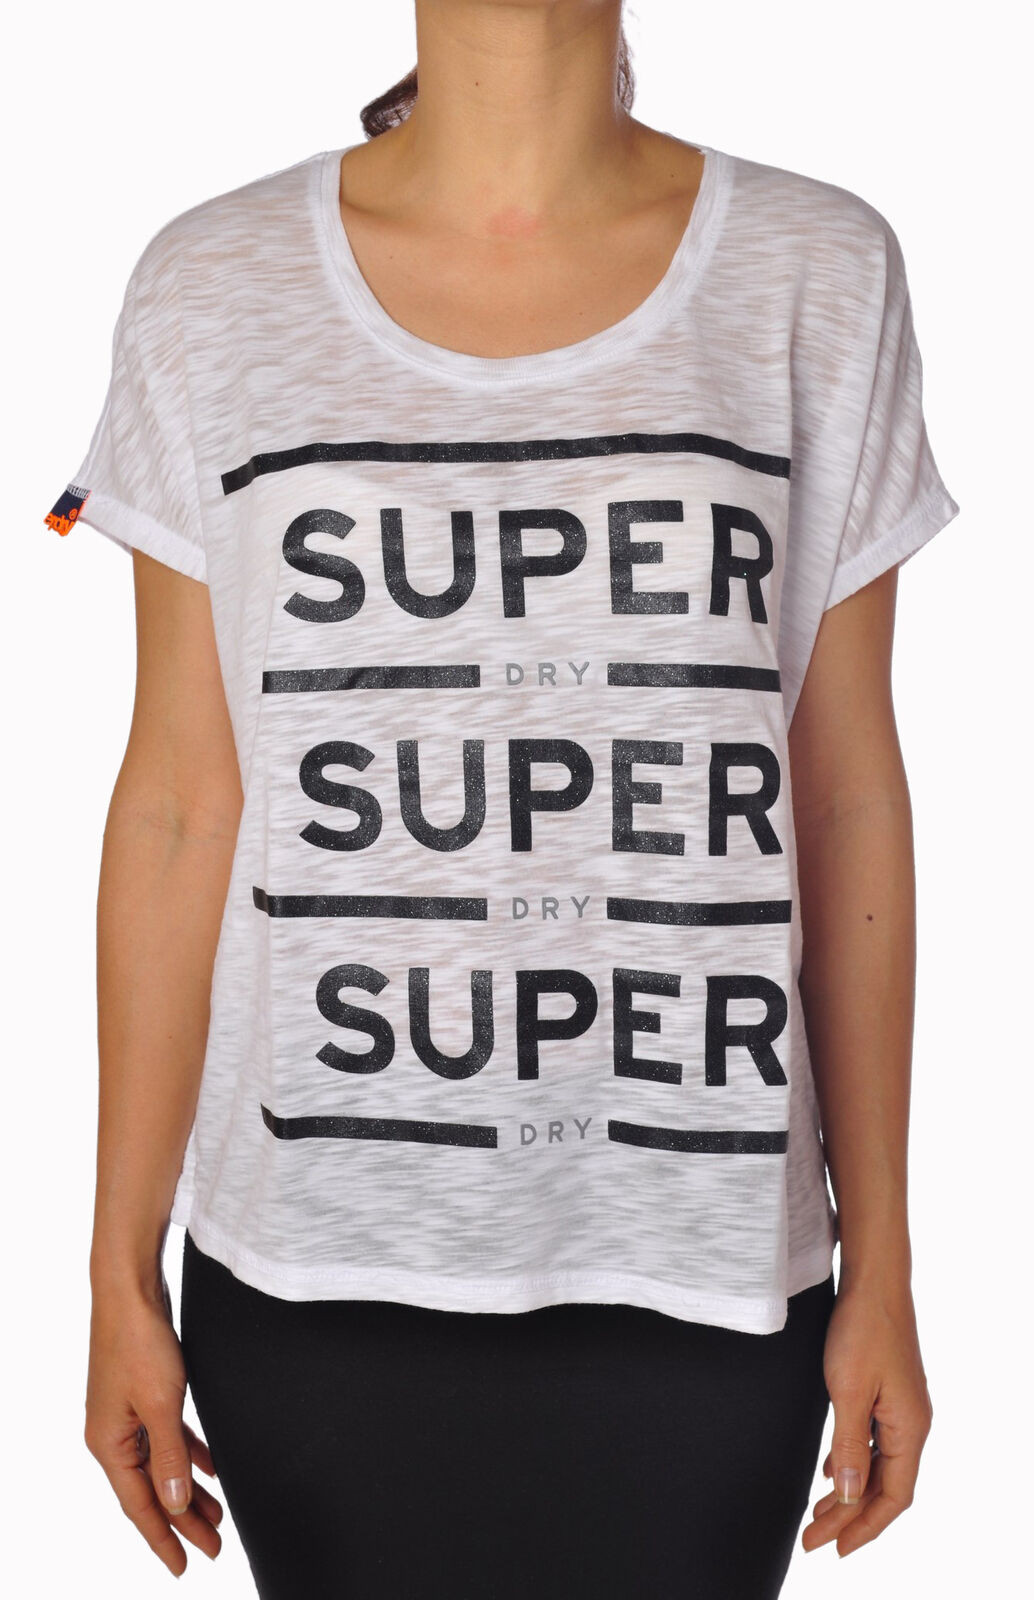 Superdry - Topwear-T-shirts - frau - 792317C181513